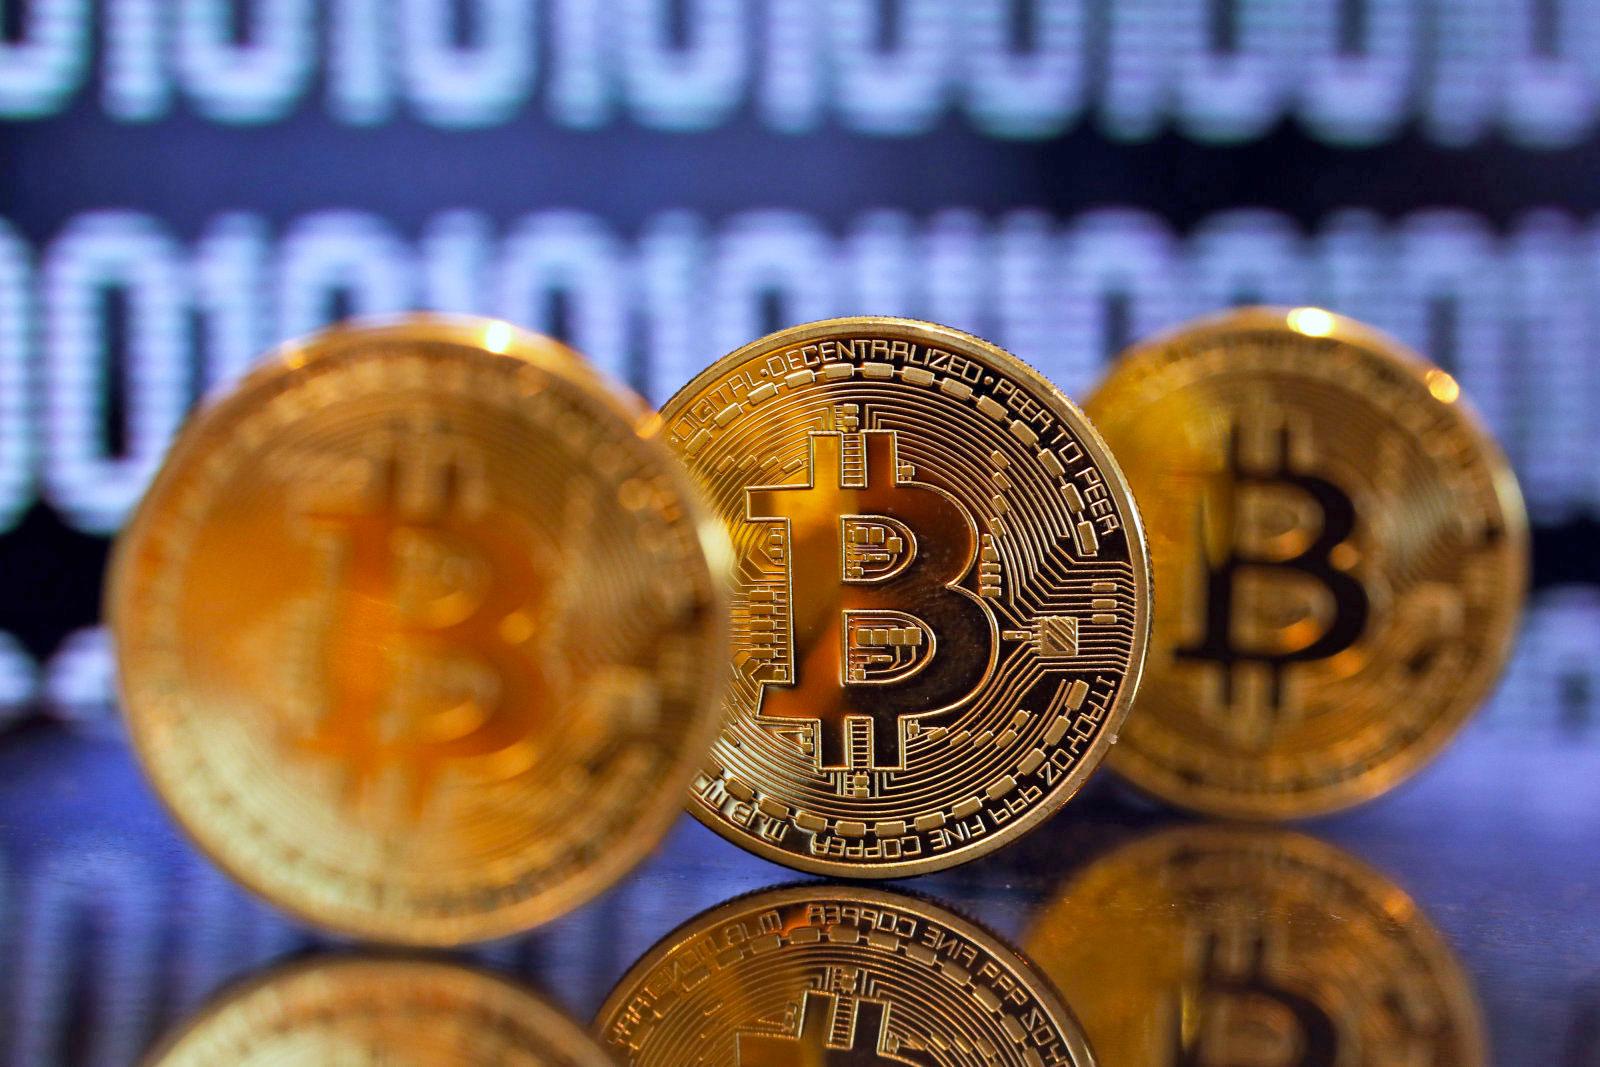 Bitcoin price at $3000